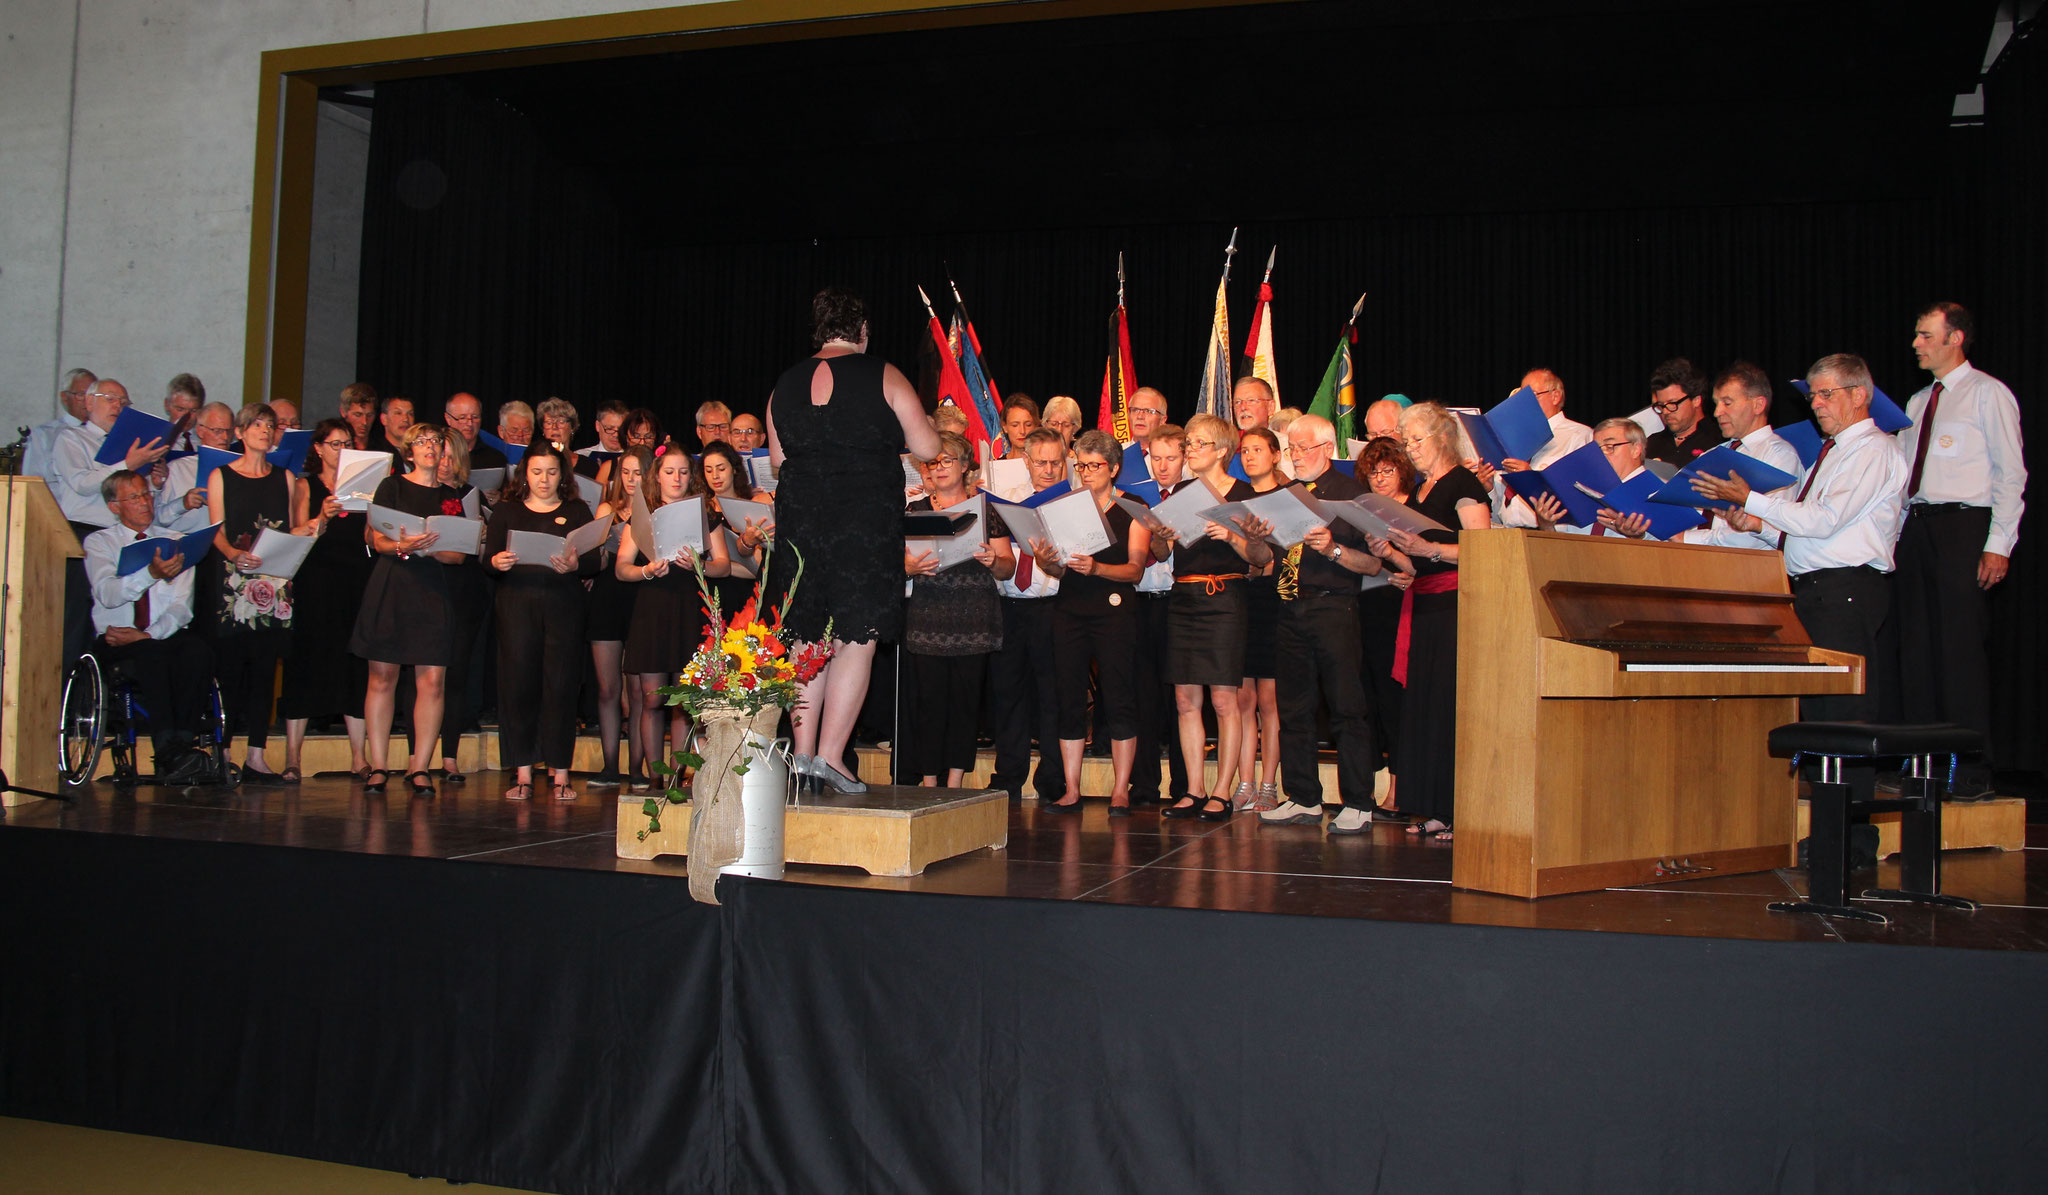 Kreissängertag Messen - Juni 2017